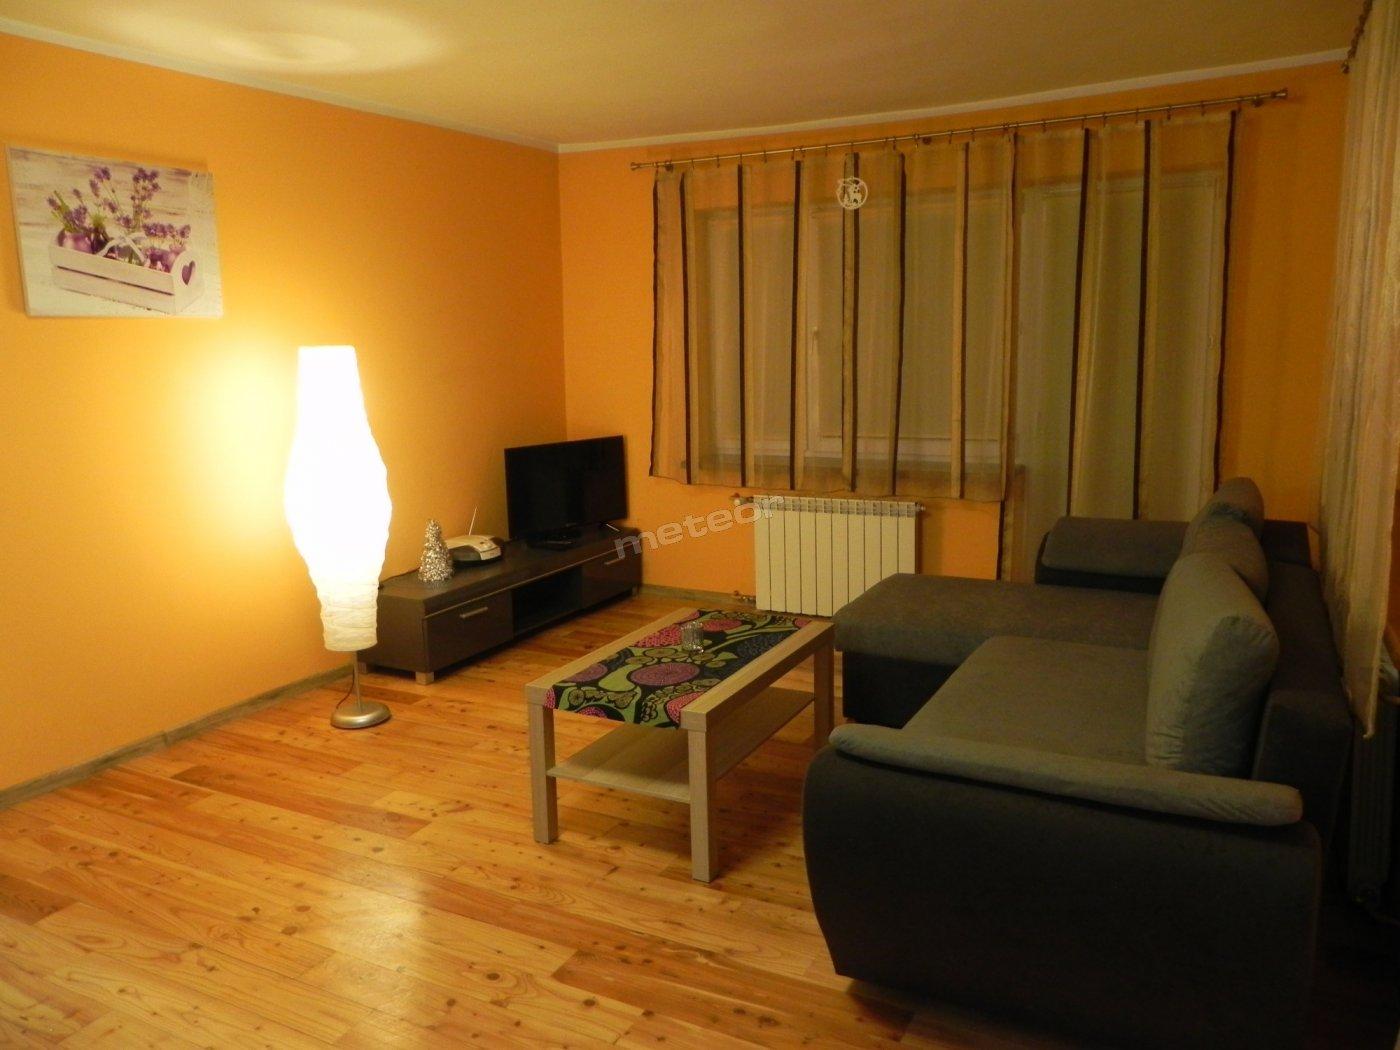 Apartament Dobra Lokalizacja